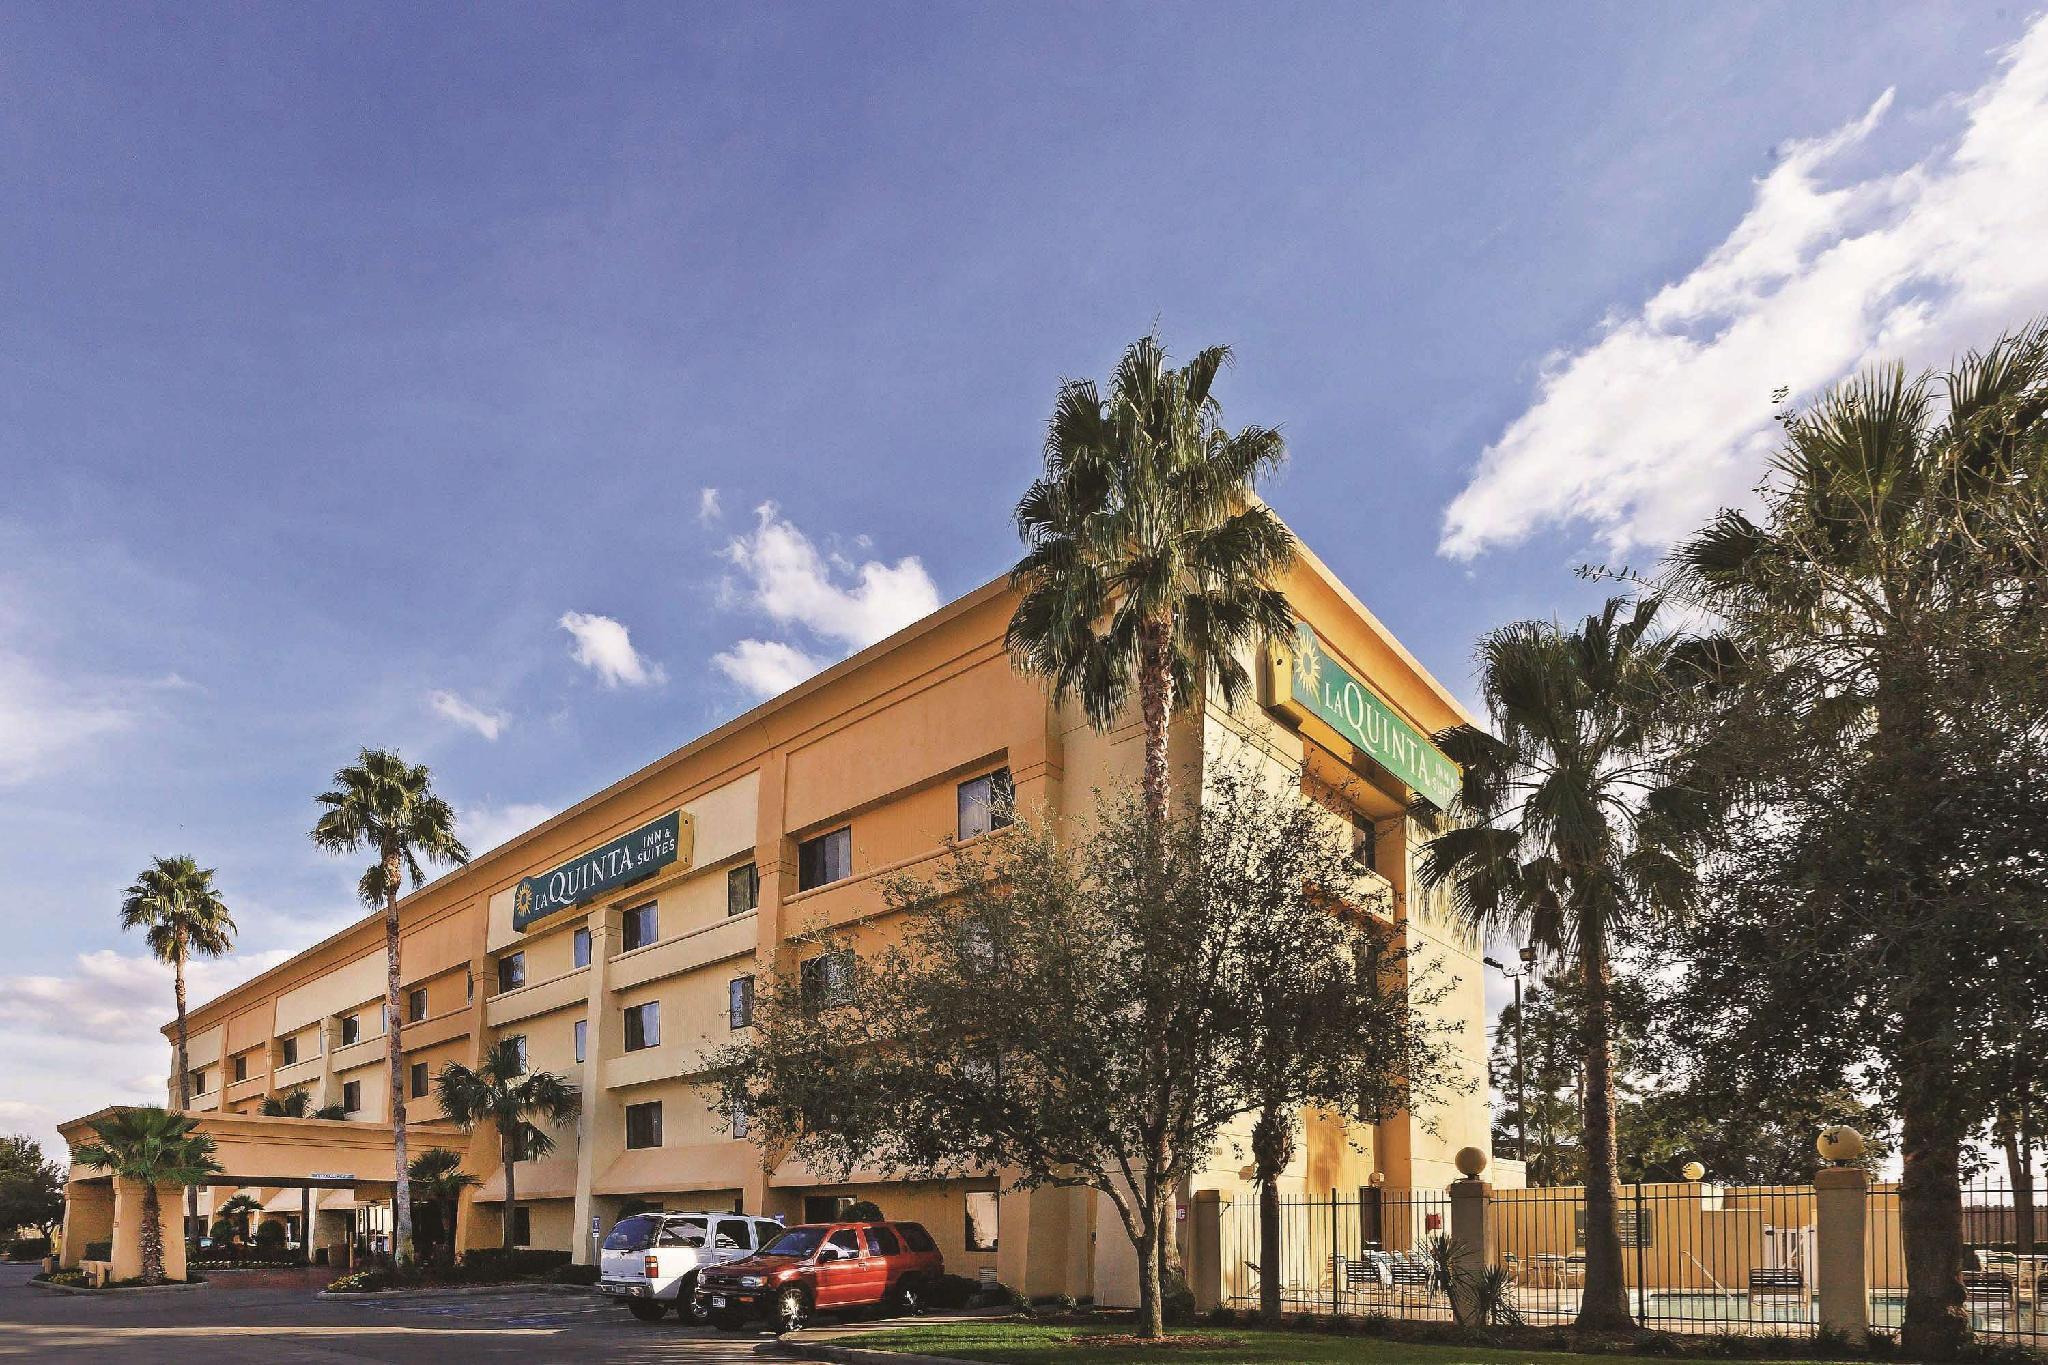 La Quinta Inn And Suites By Wyndham Houston Northwest